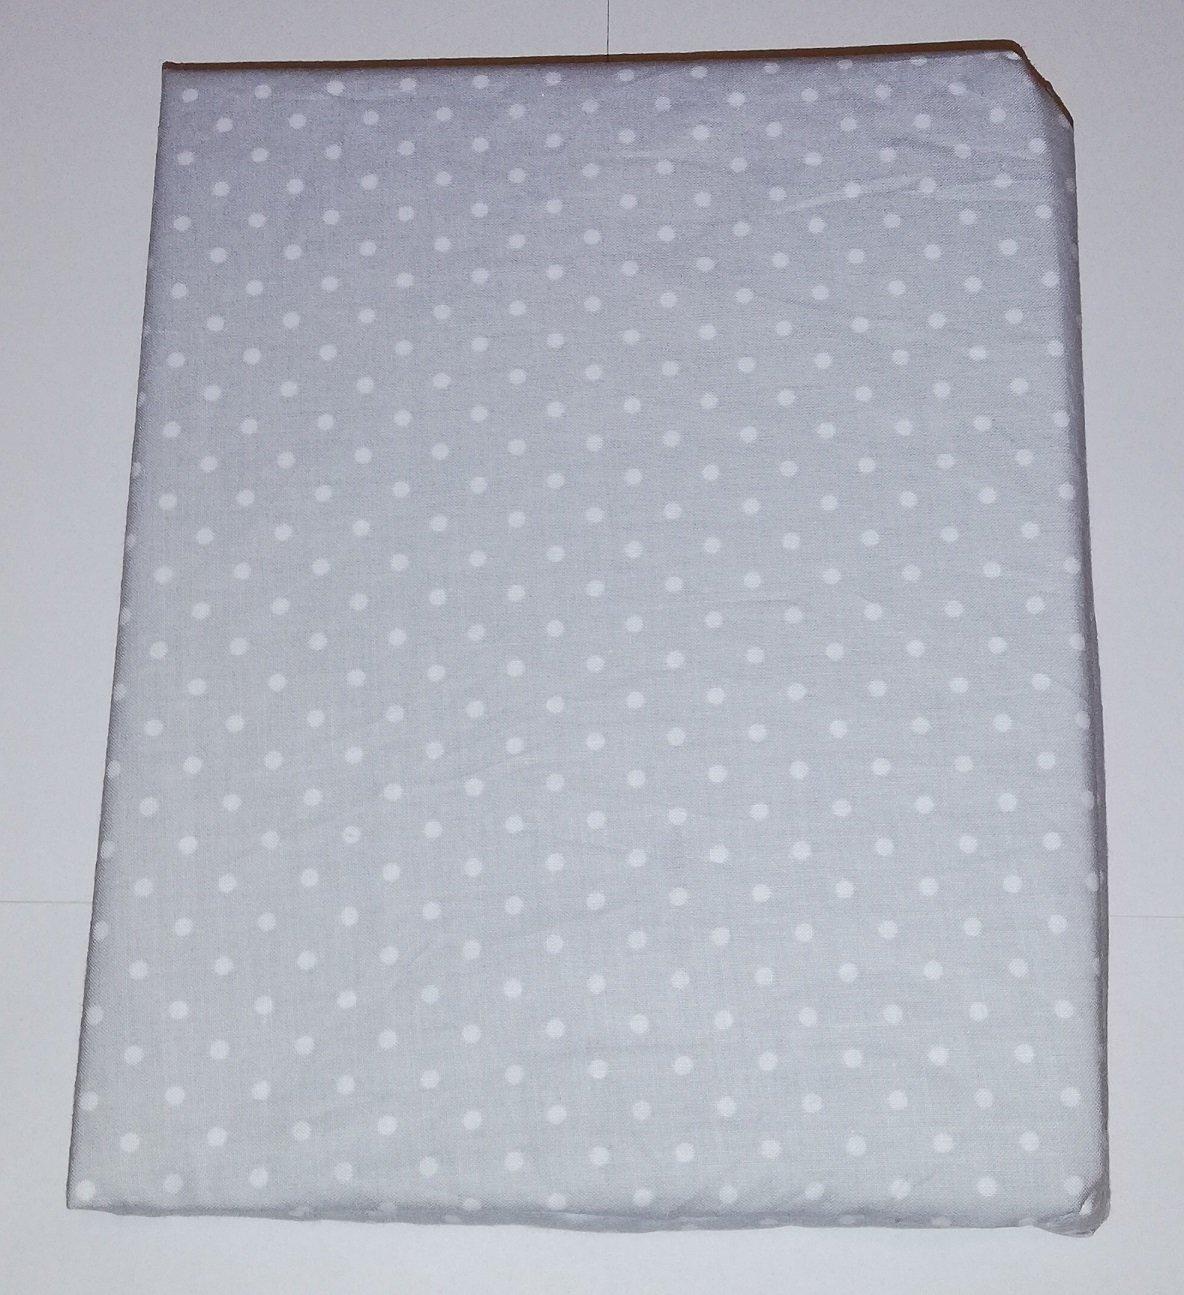 Bavln�n� prost�radlo 120x60 cm �ed� s b�l�mi v�t��mi punt�ky